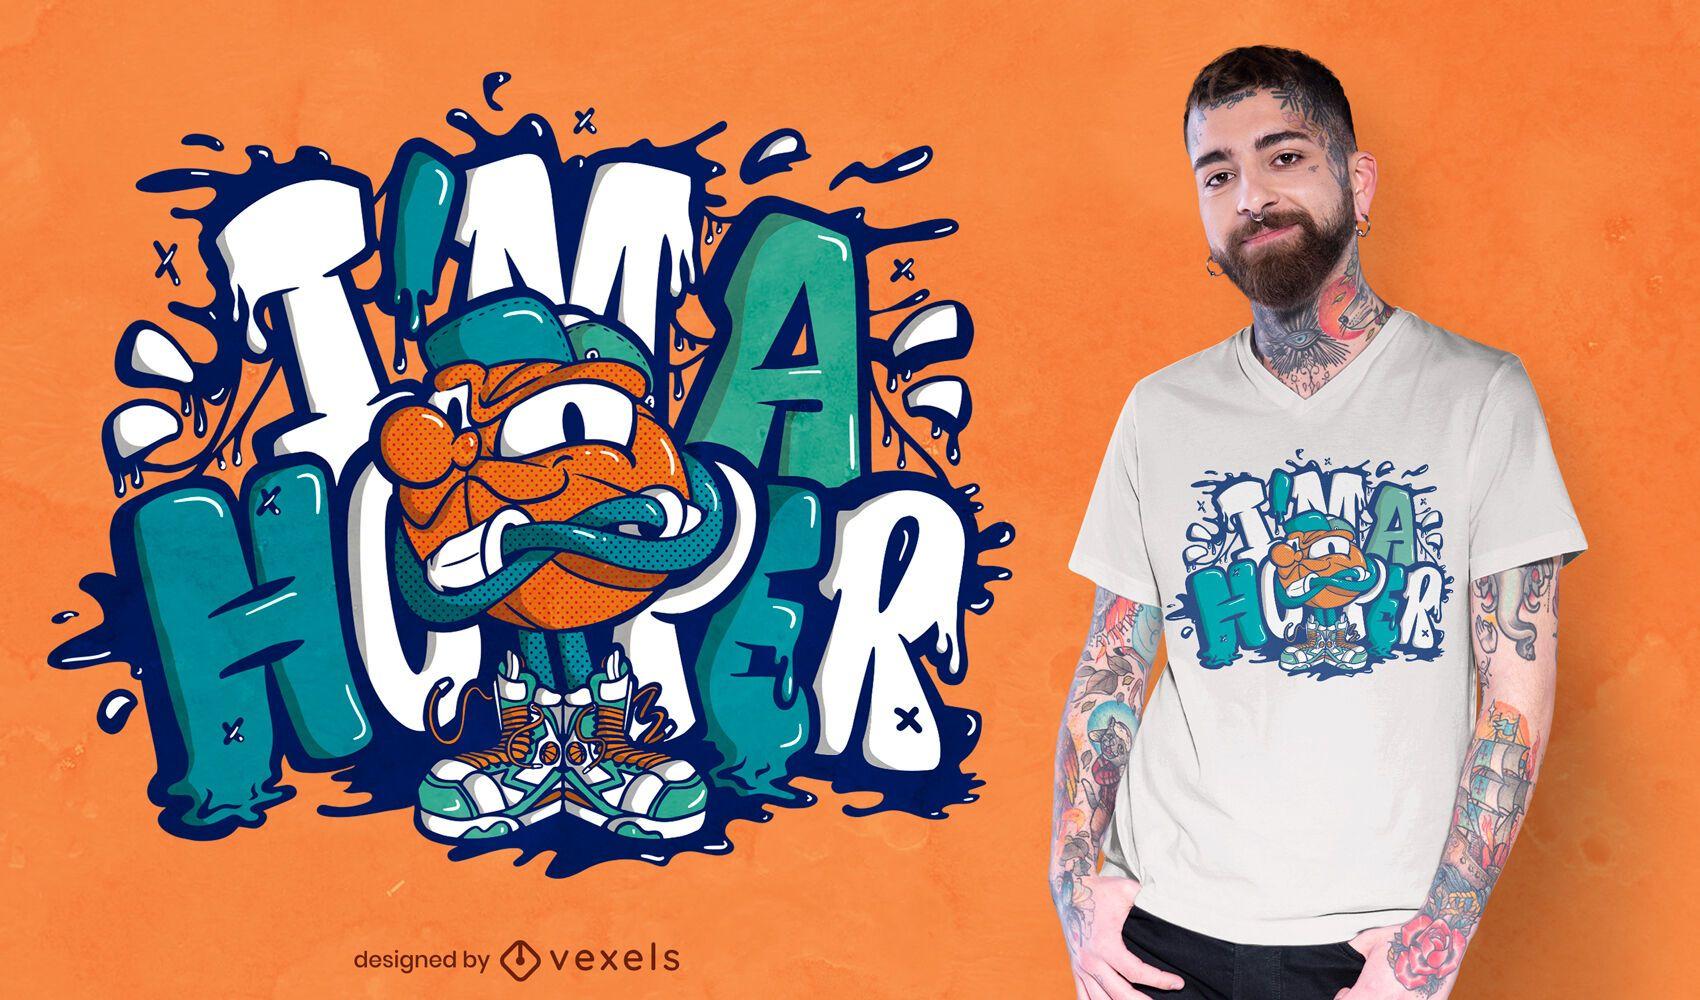 Dise?o de camiseta de graffiti de baloncesto.